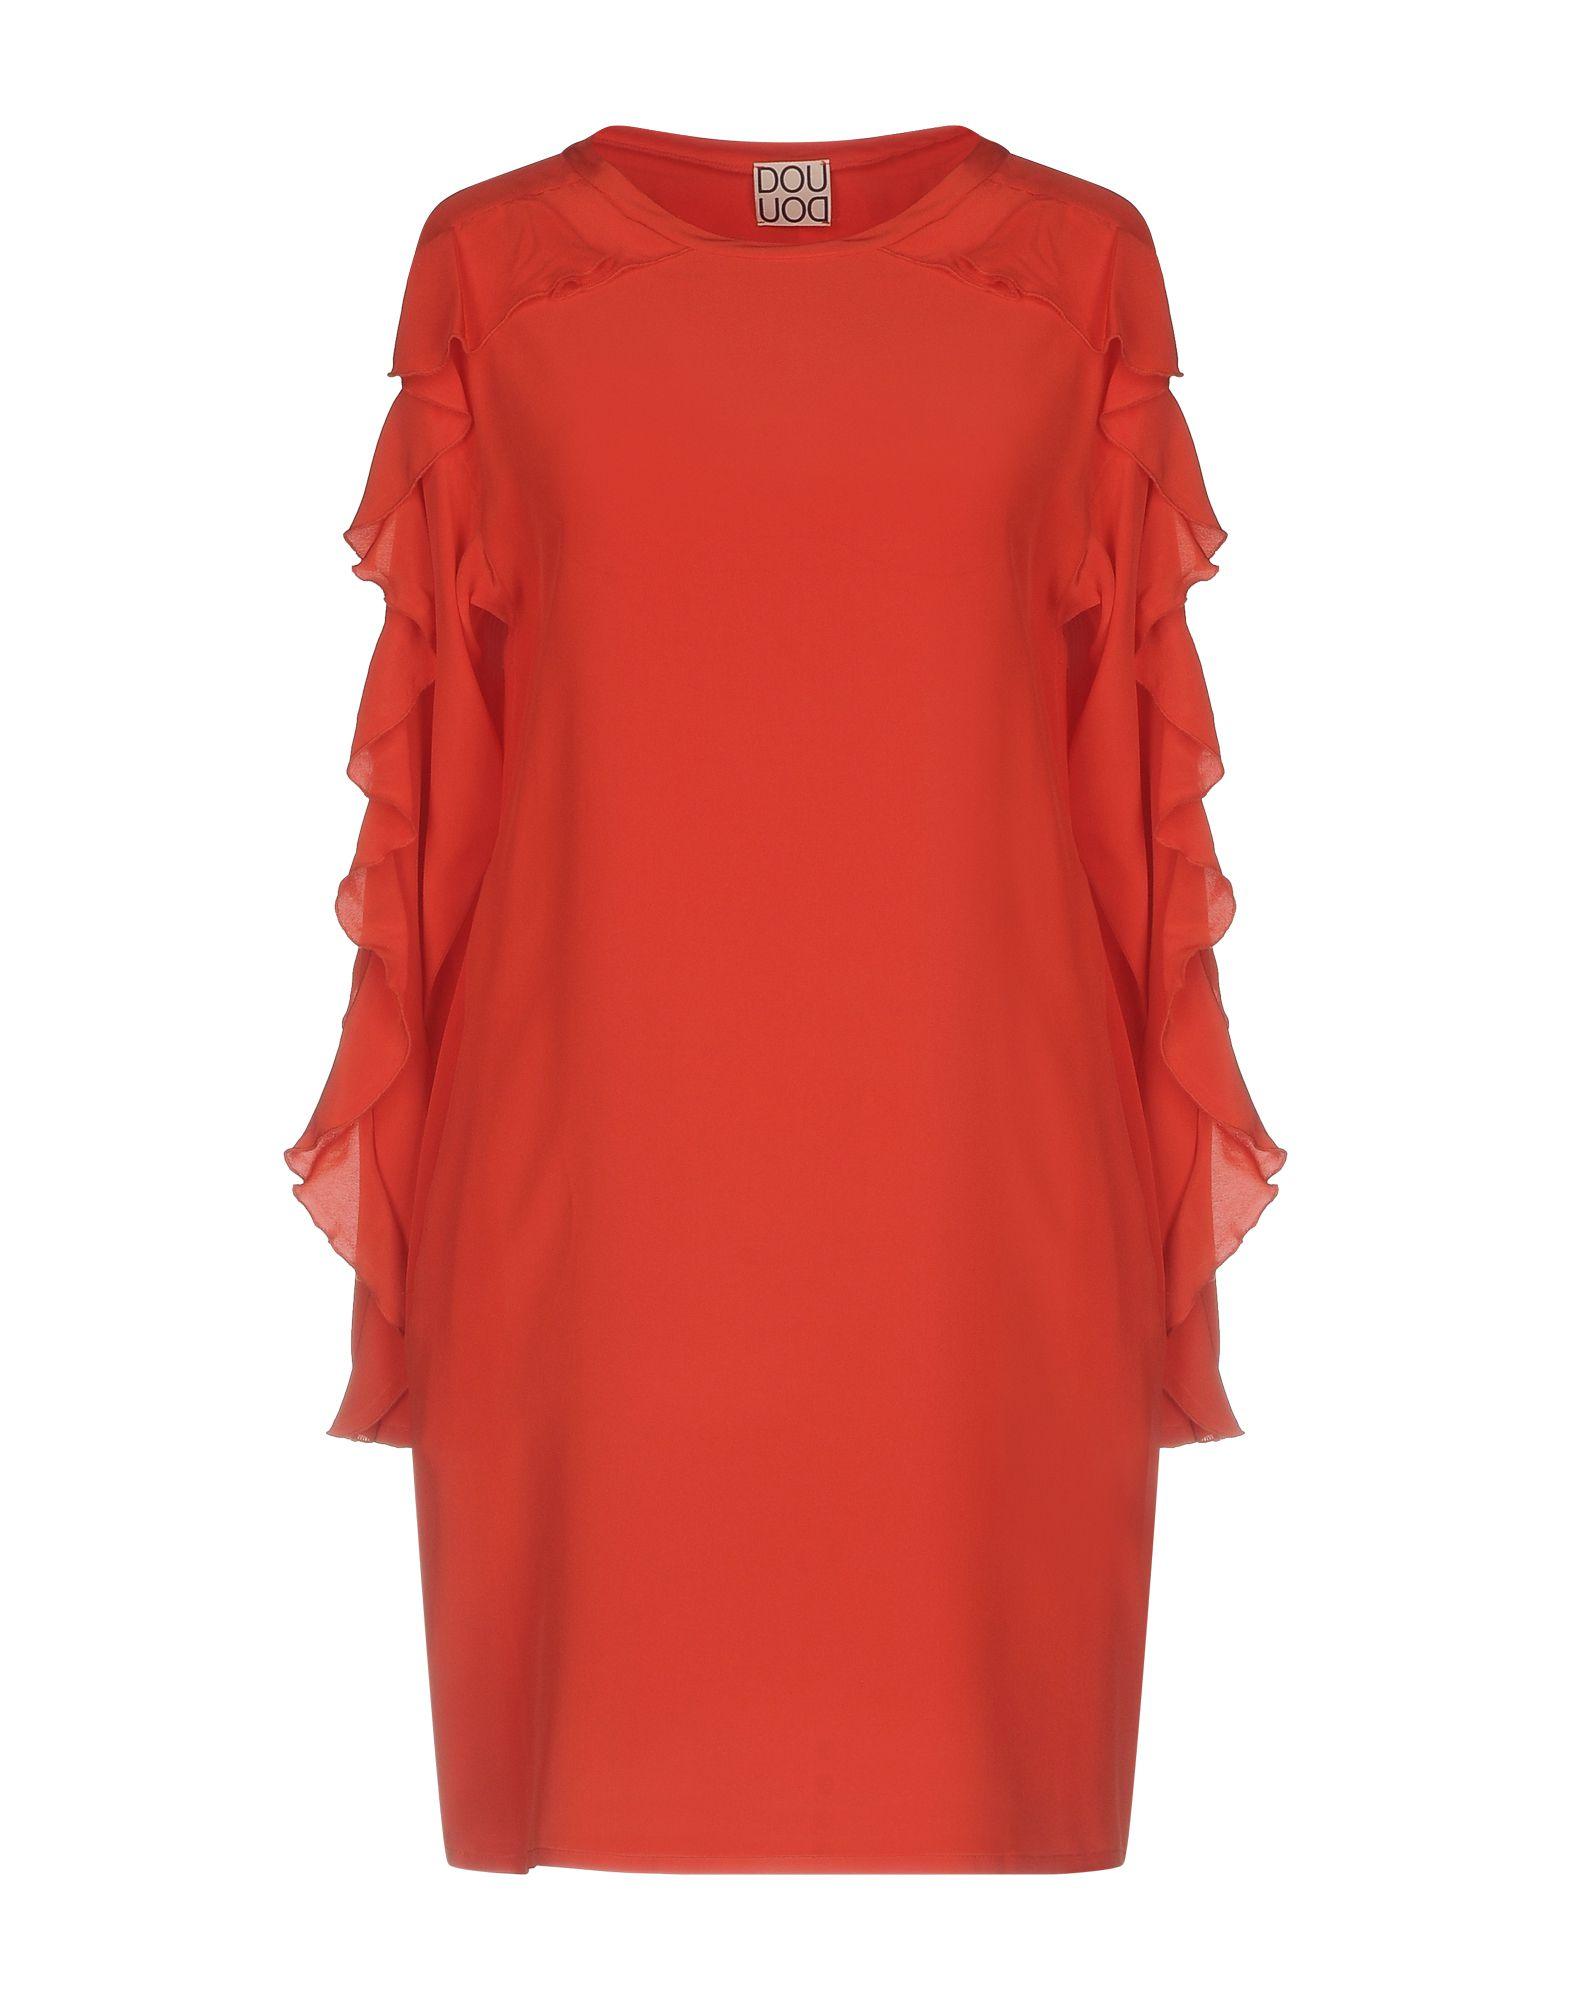 DOUUOD Short Dress in Red